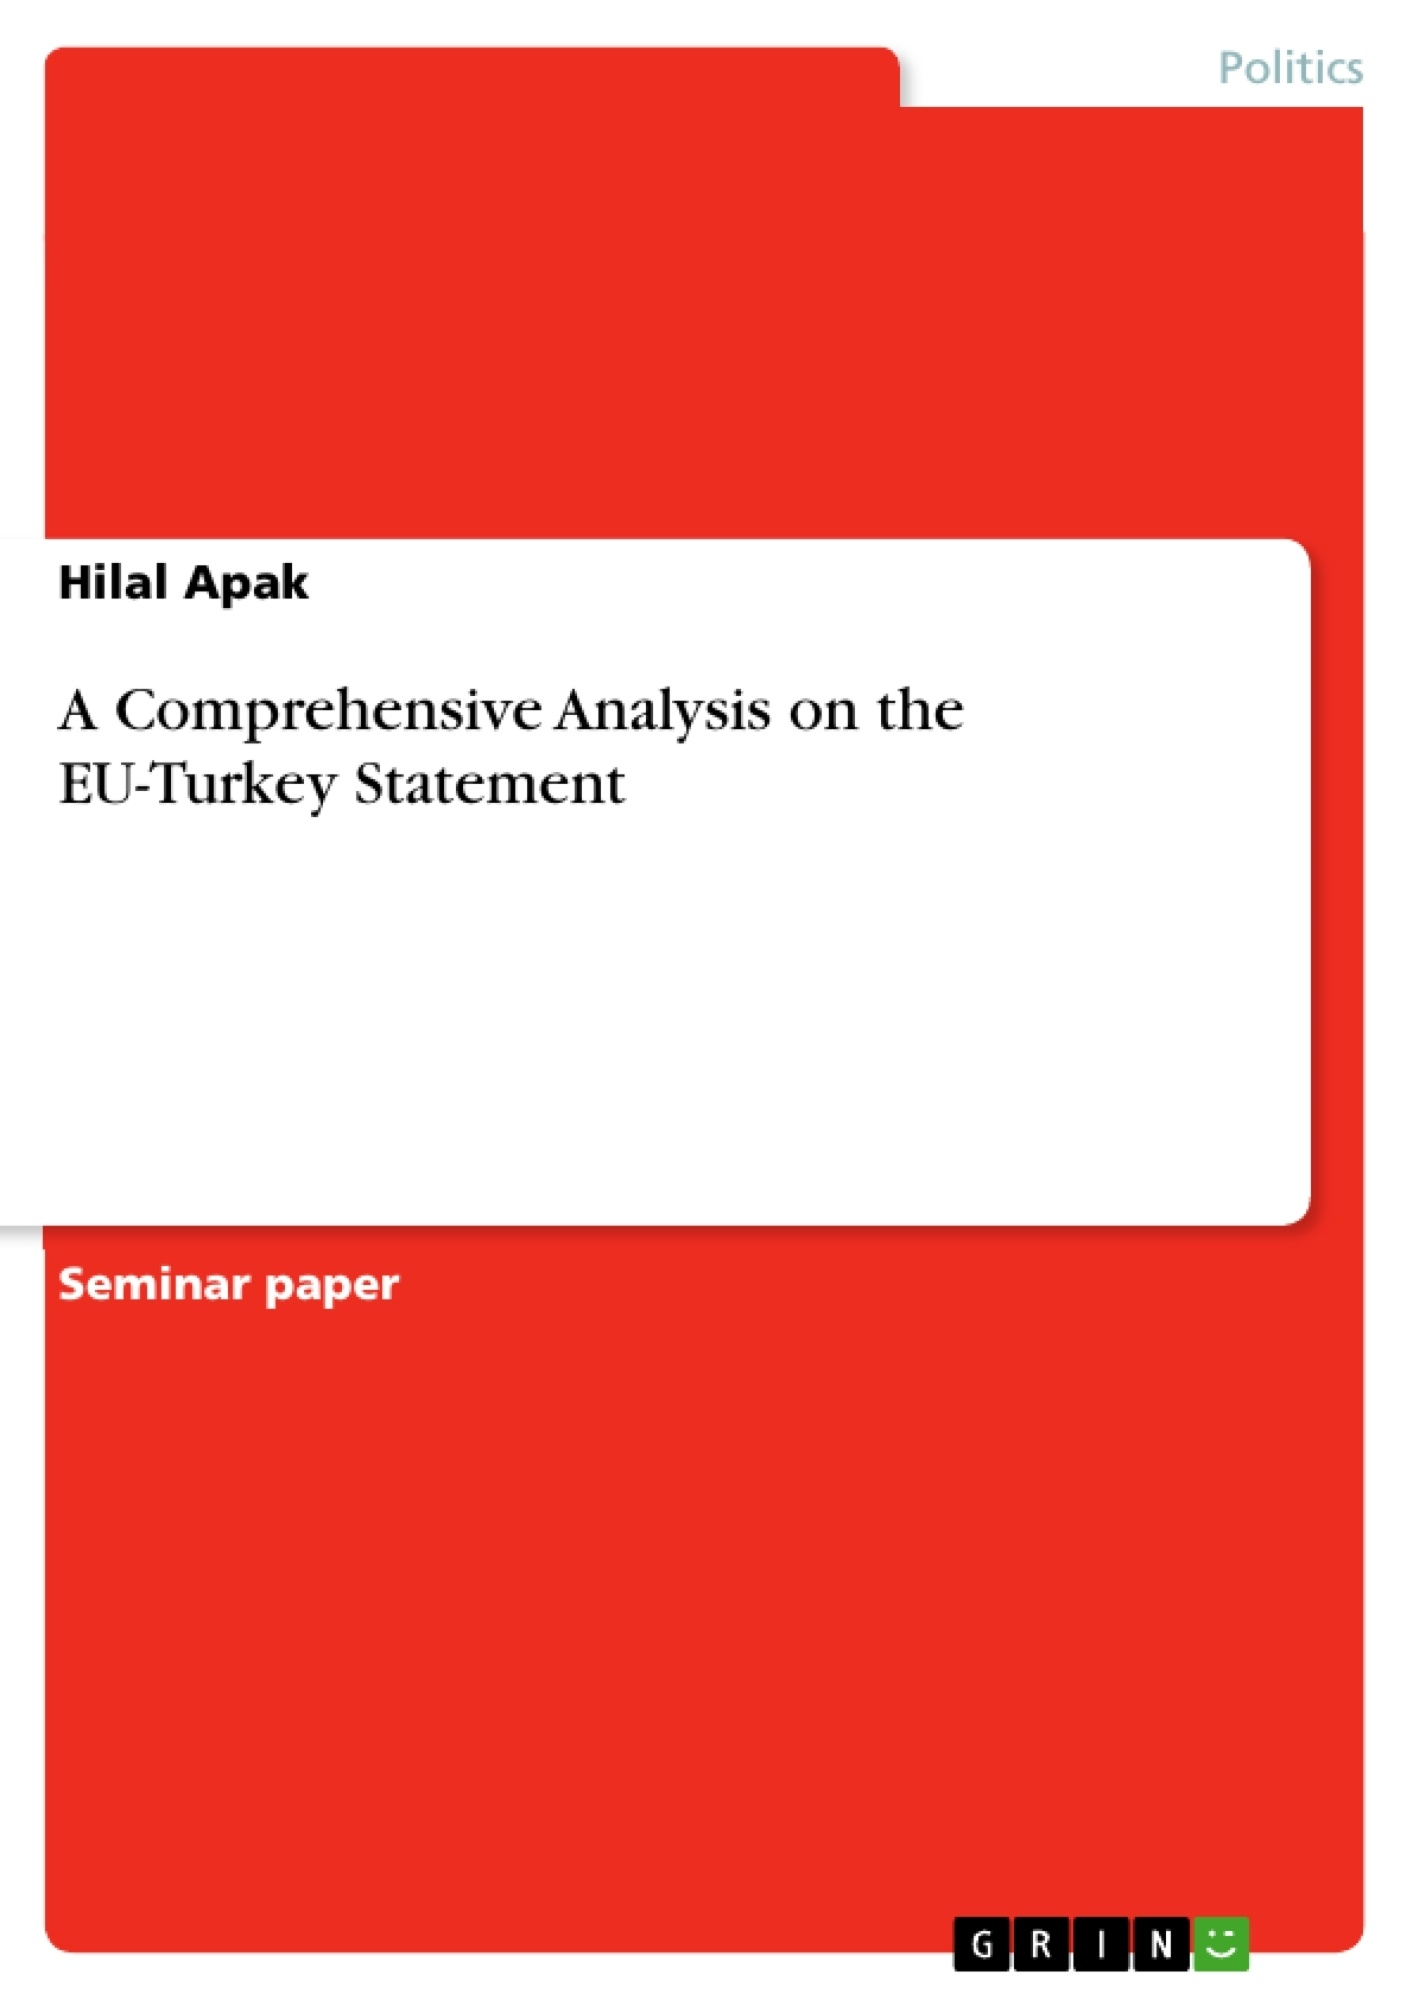 Title: A Comprehensive Analysis on the EU-Turkey Statement